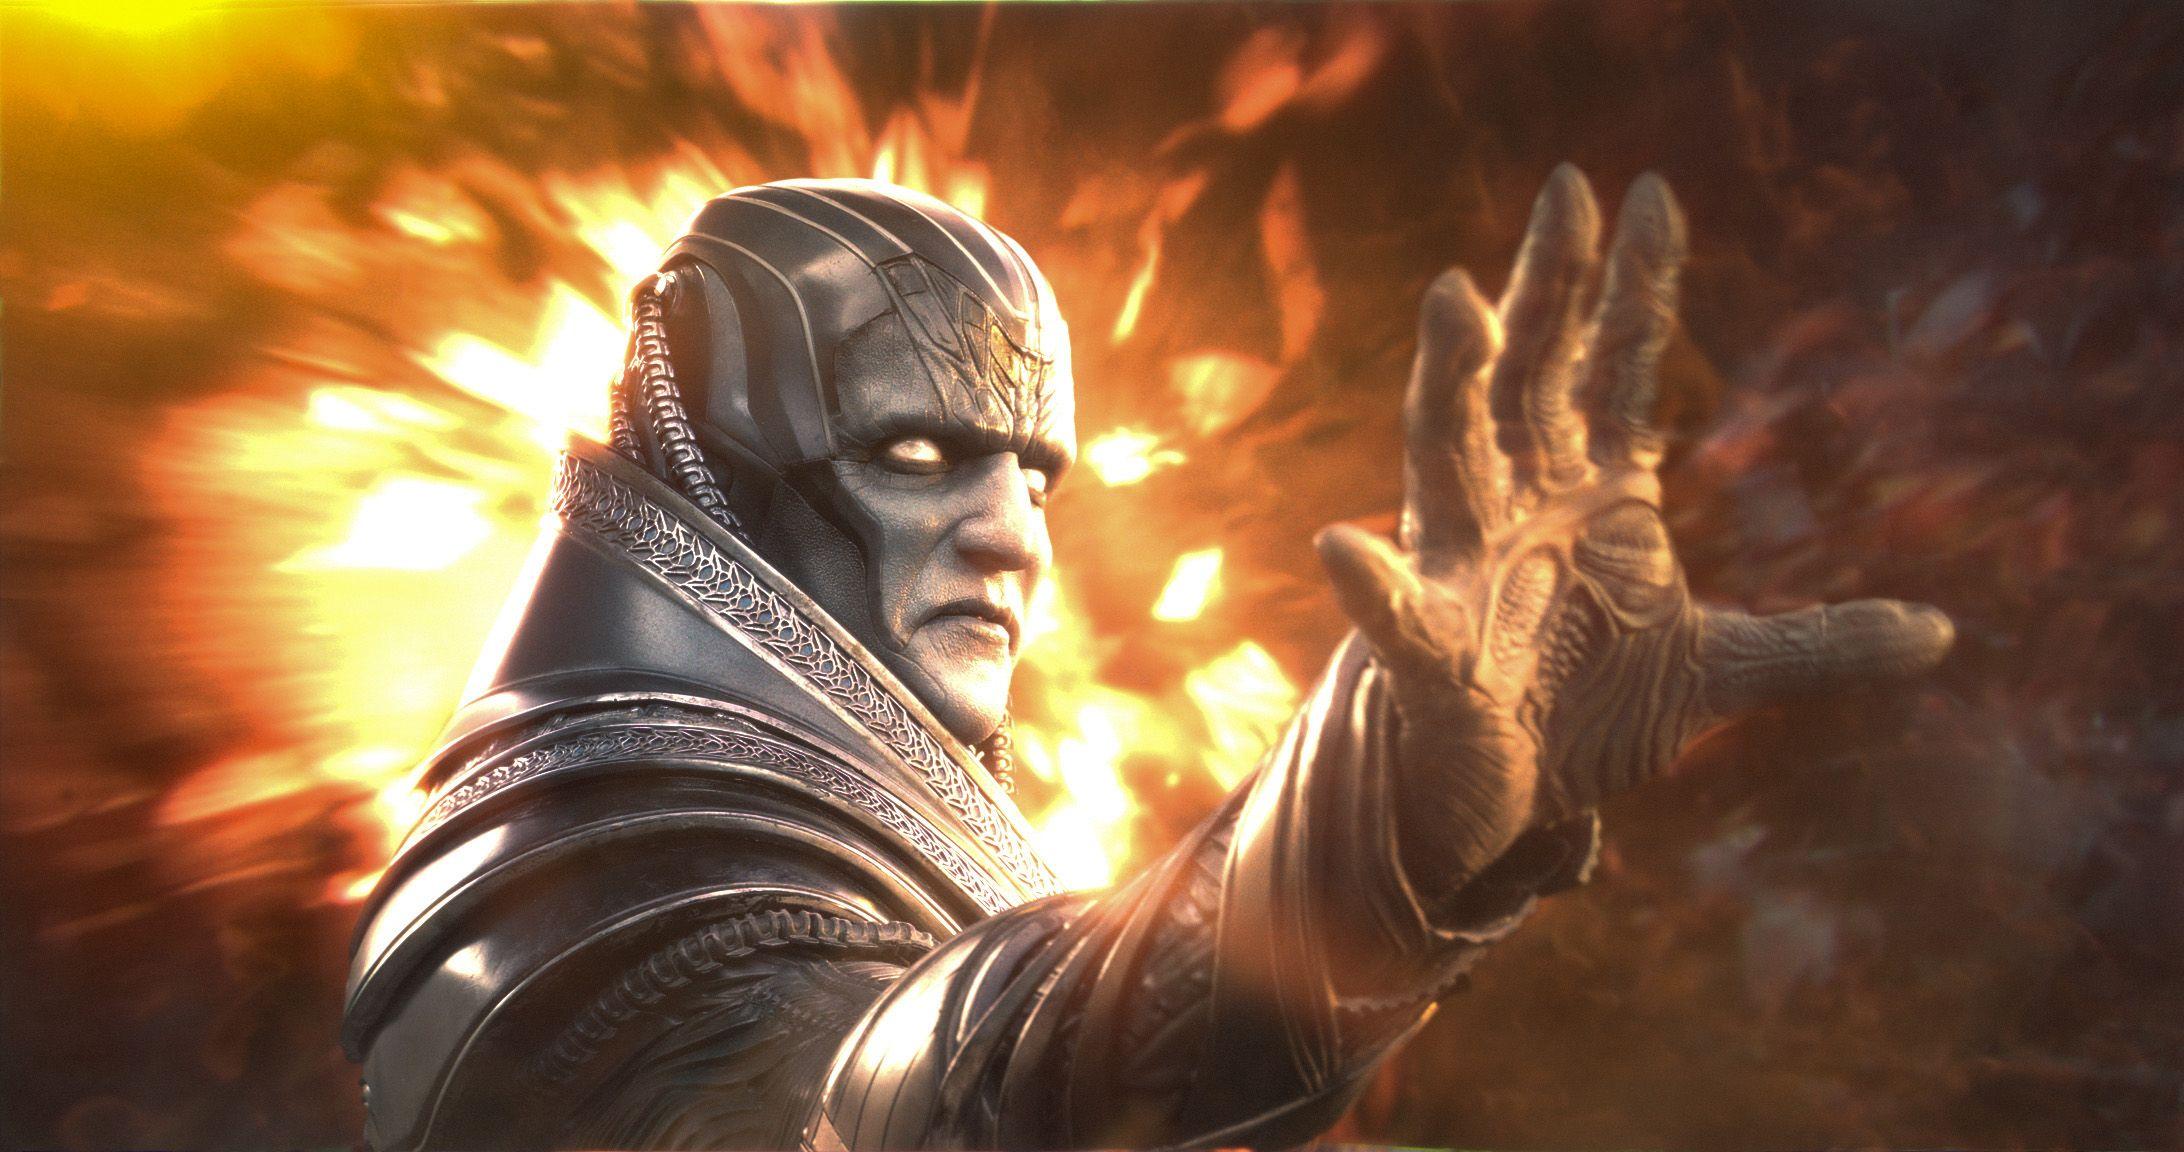 apocalypse 2020 movies release superhero upcoming oscar marvel collider mutant latest